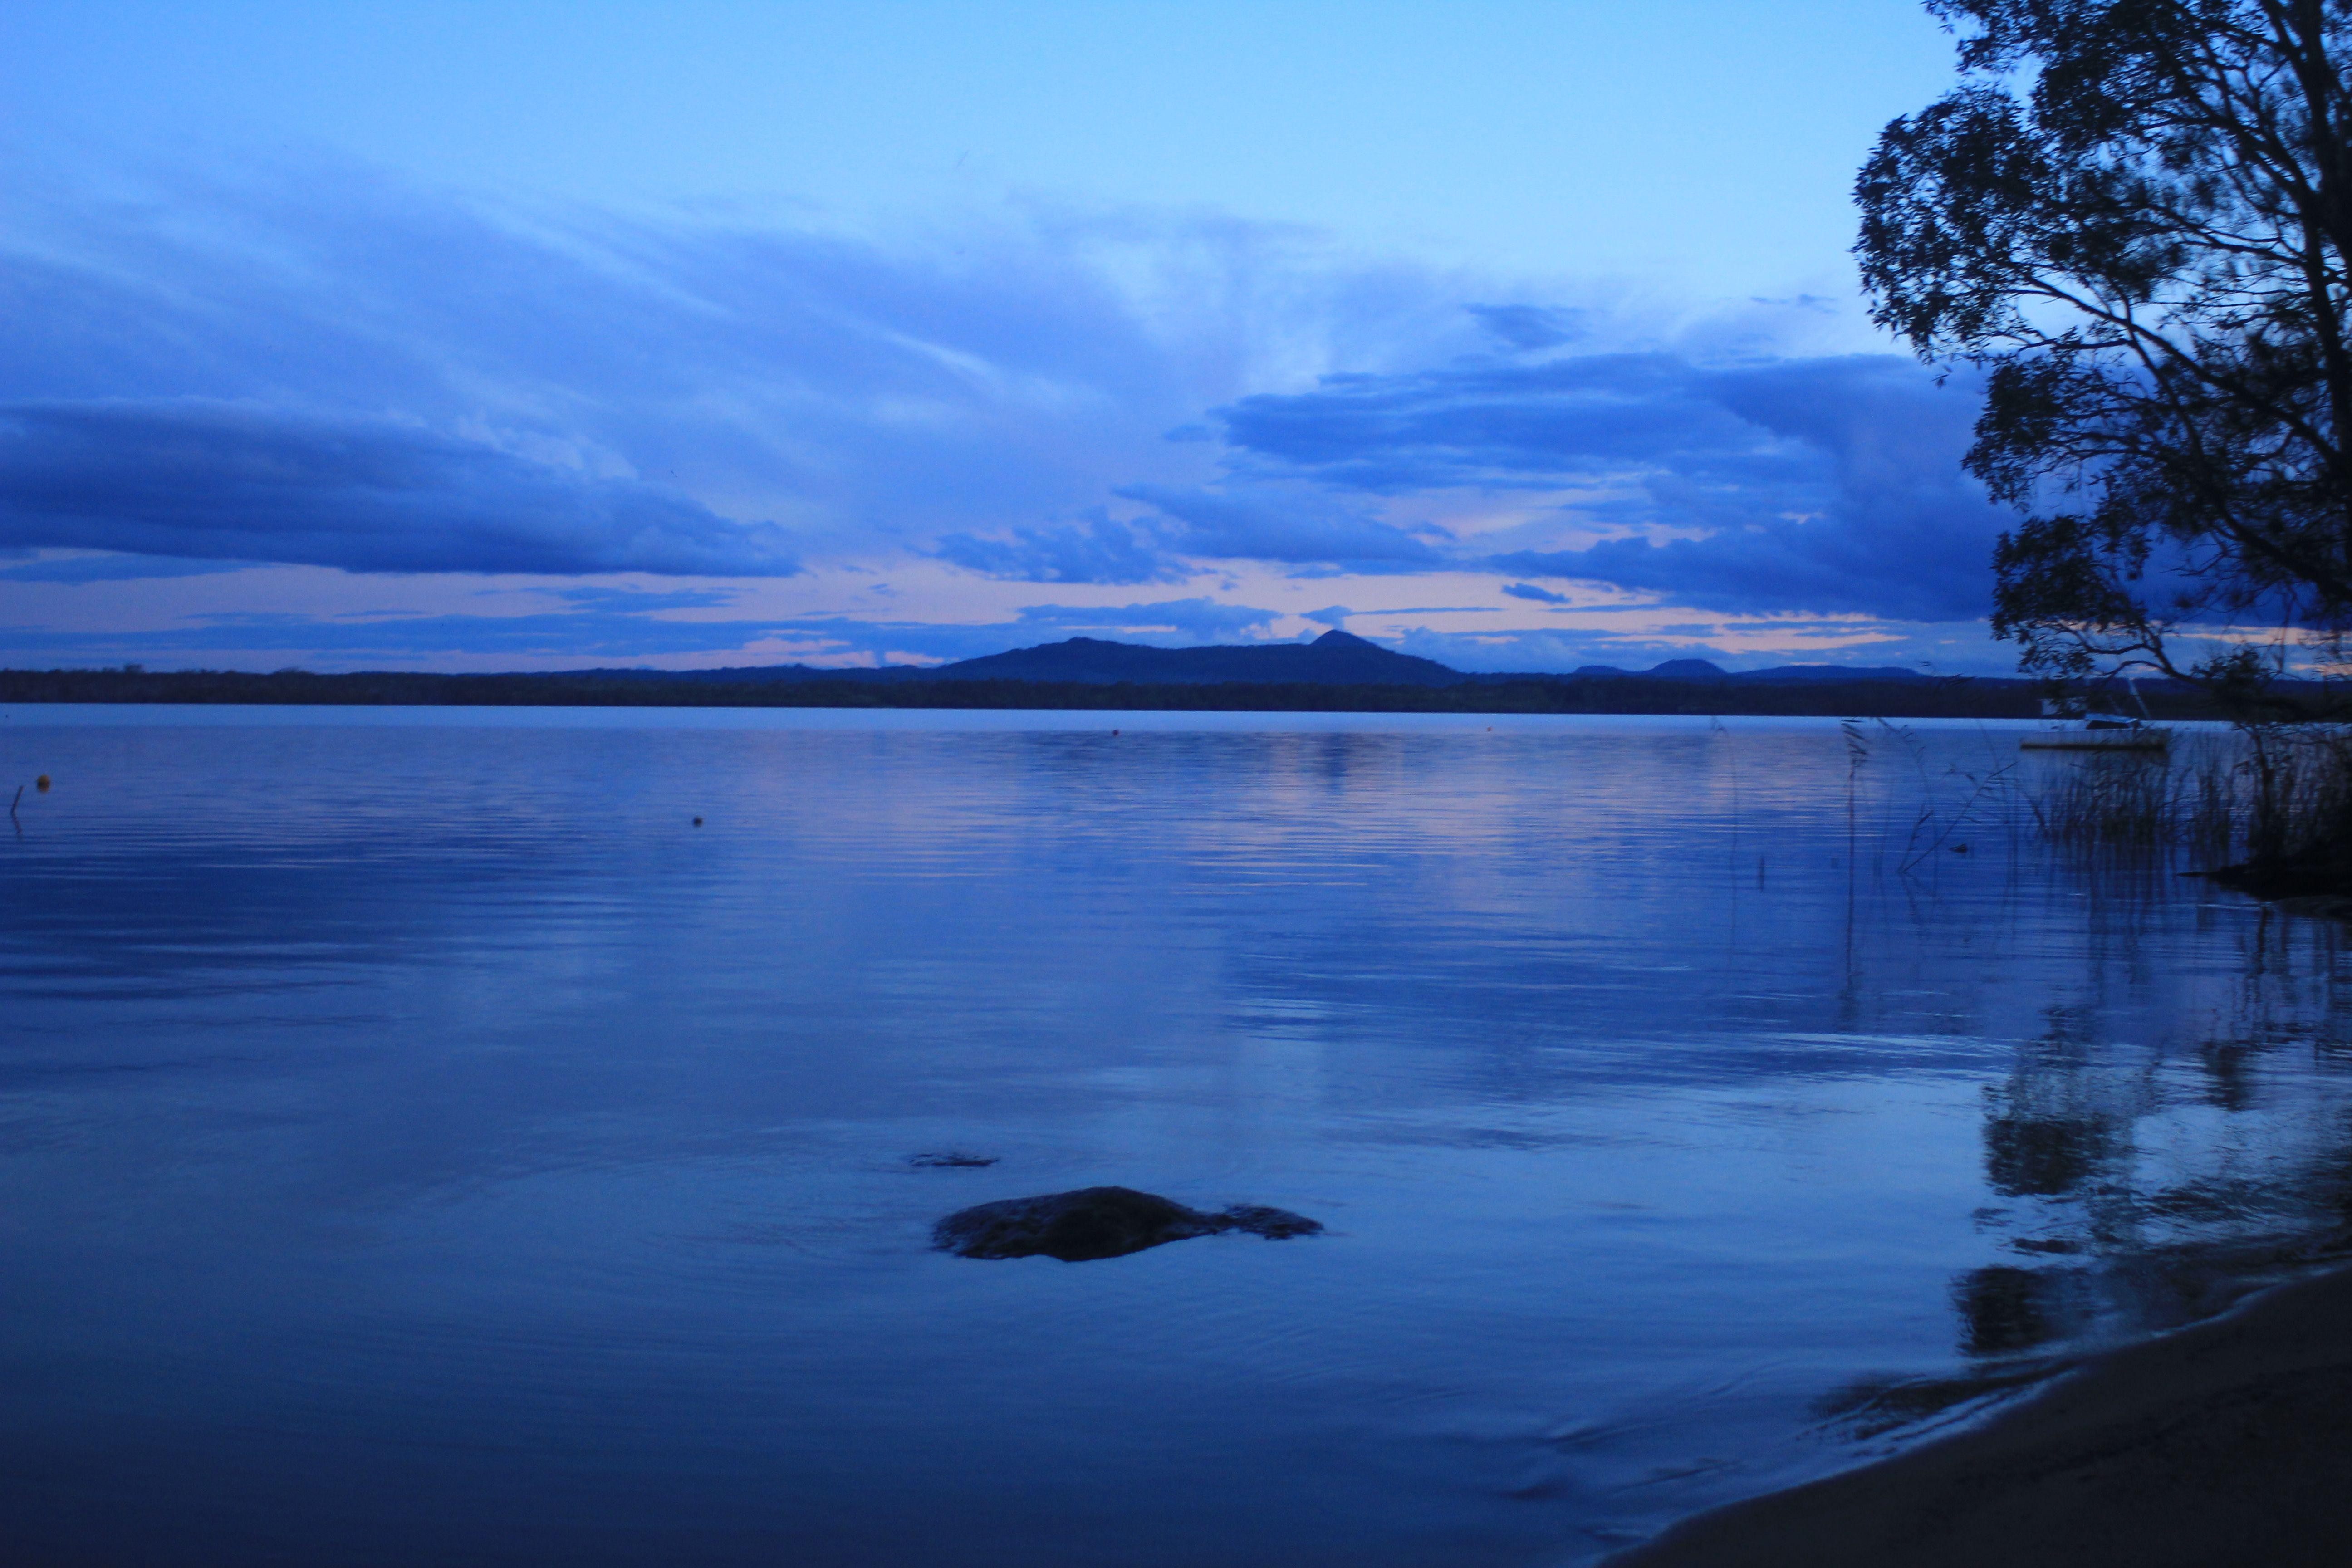 Lake near Noosa Qld, Australia